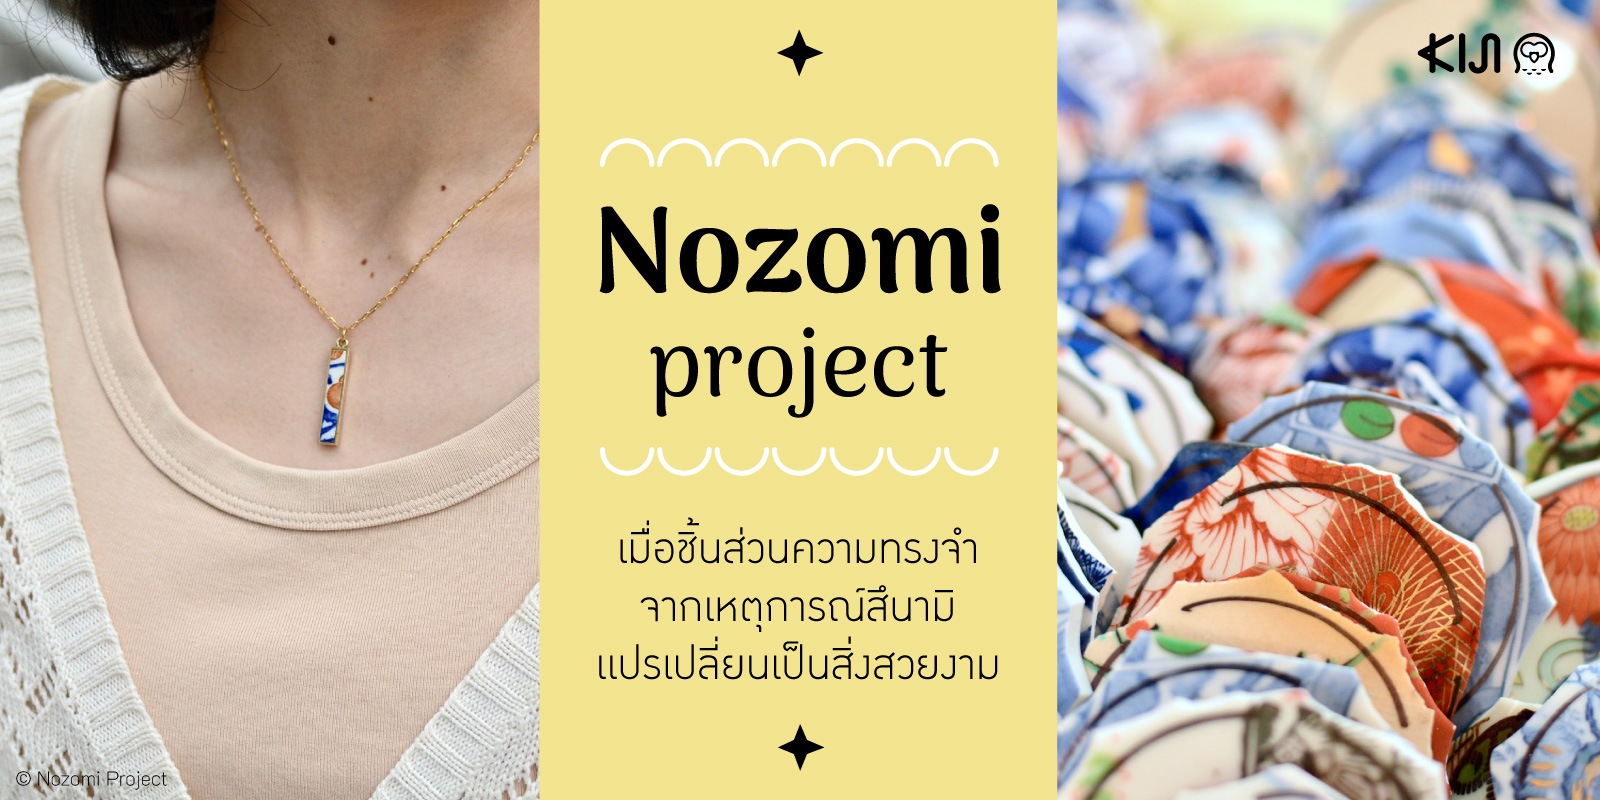 Nozomi Project แบรนด์ Upcycled Accessories จากญี่ปุ่น